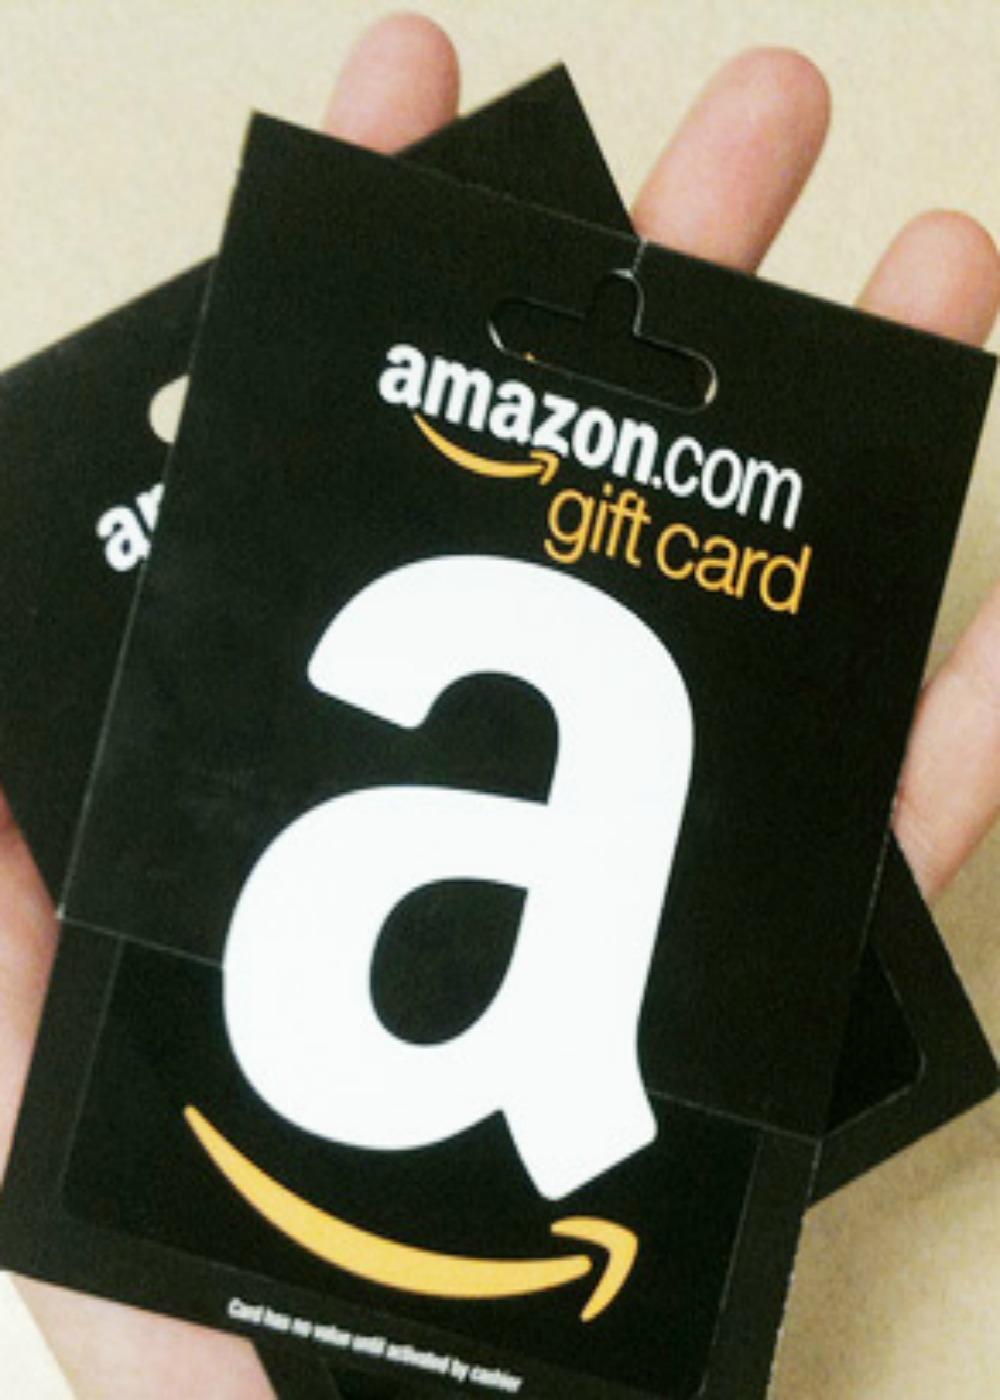 Amazon-Gift-Card1.jpg